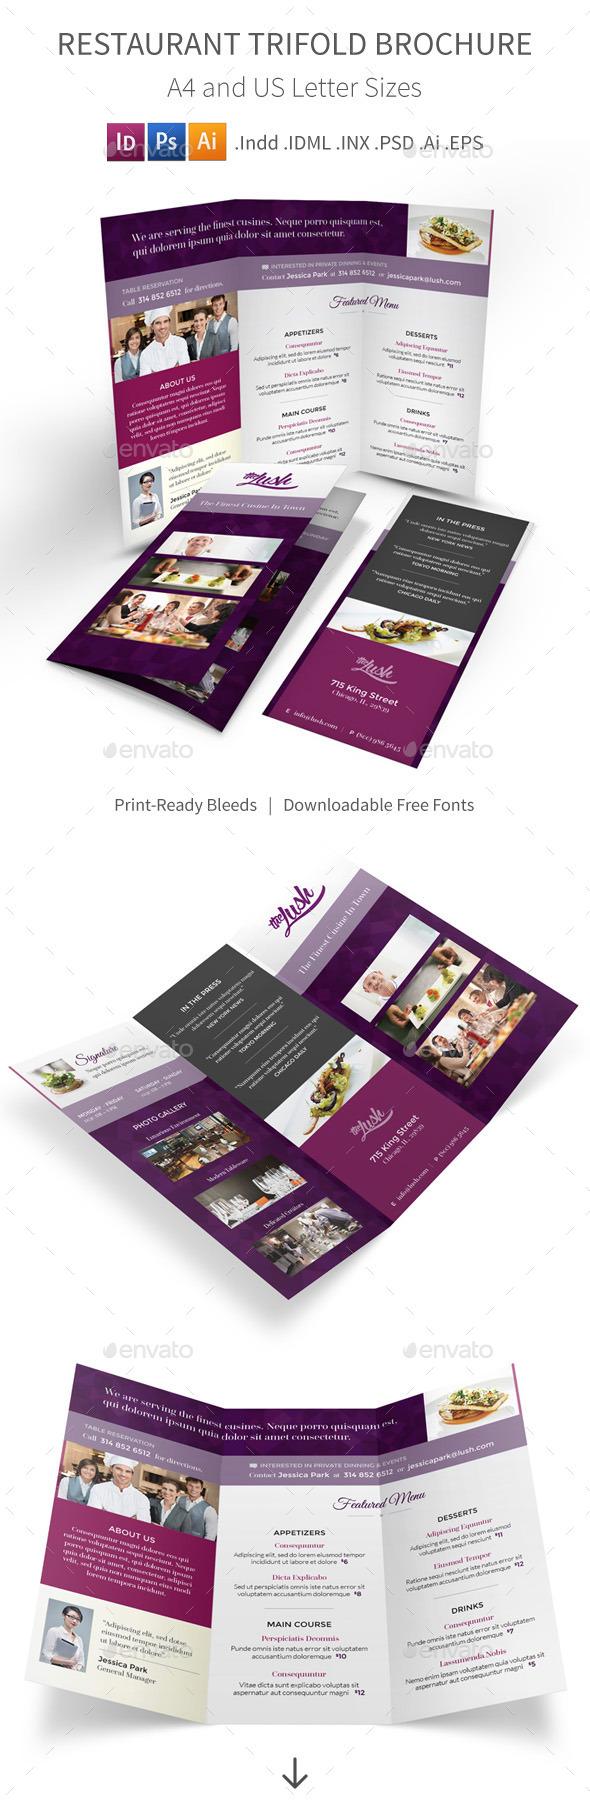 Restaurant Trifold Brochure - Informational Brochures